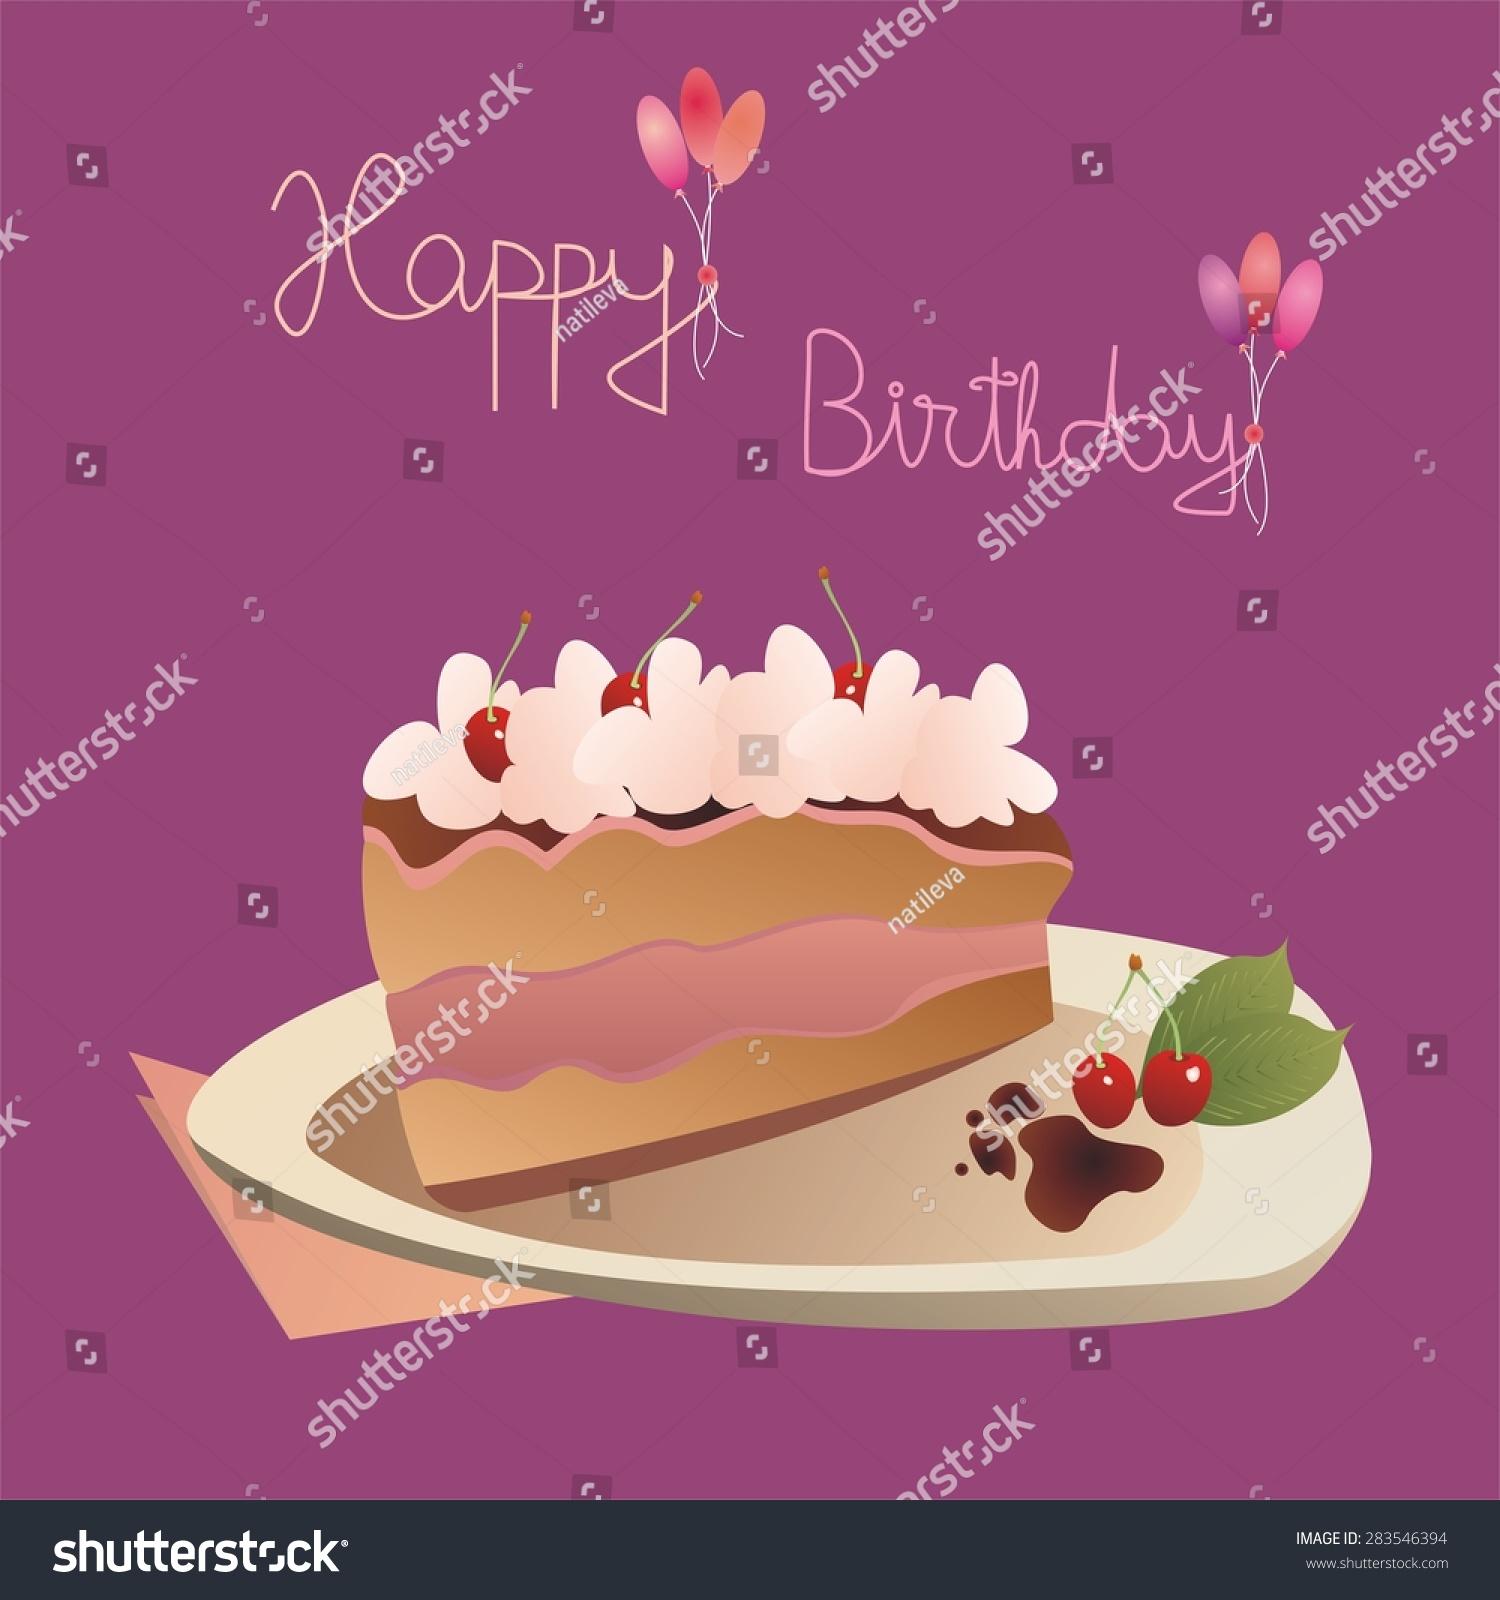 Birthday Card Slice Cake On Plate Stock Vector Royalty Free